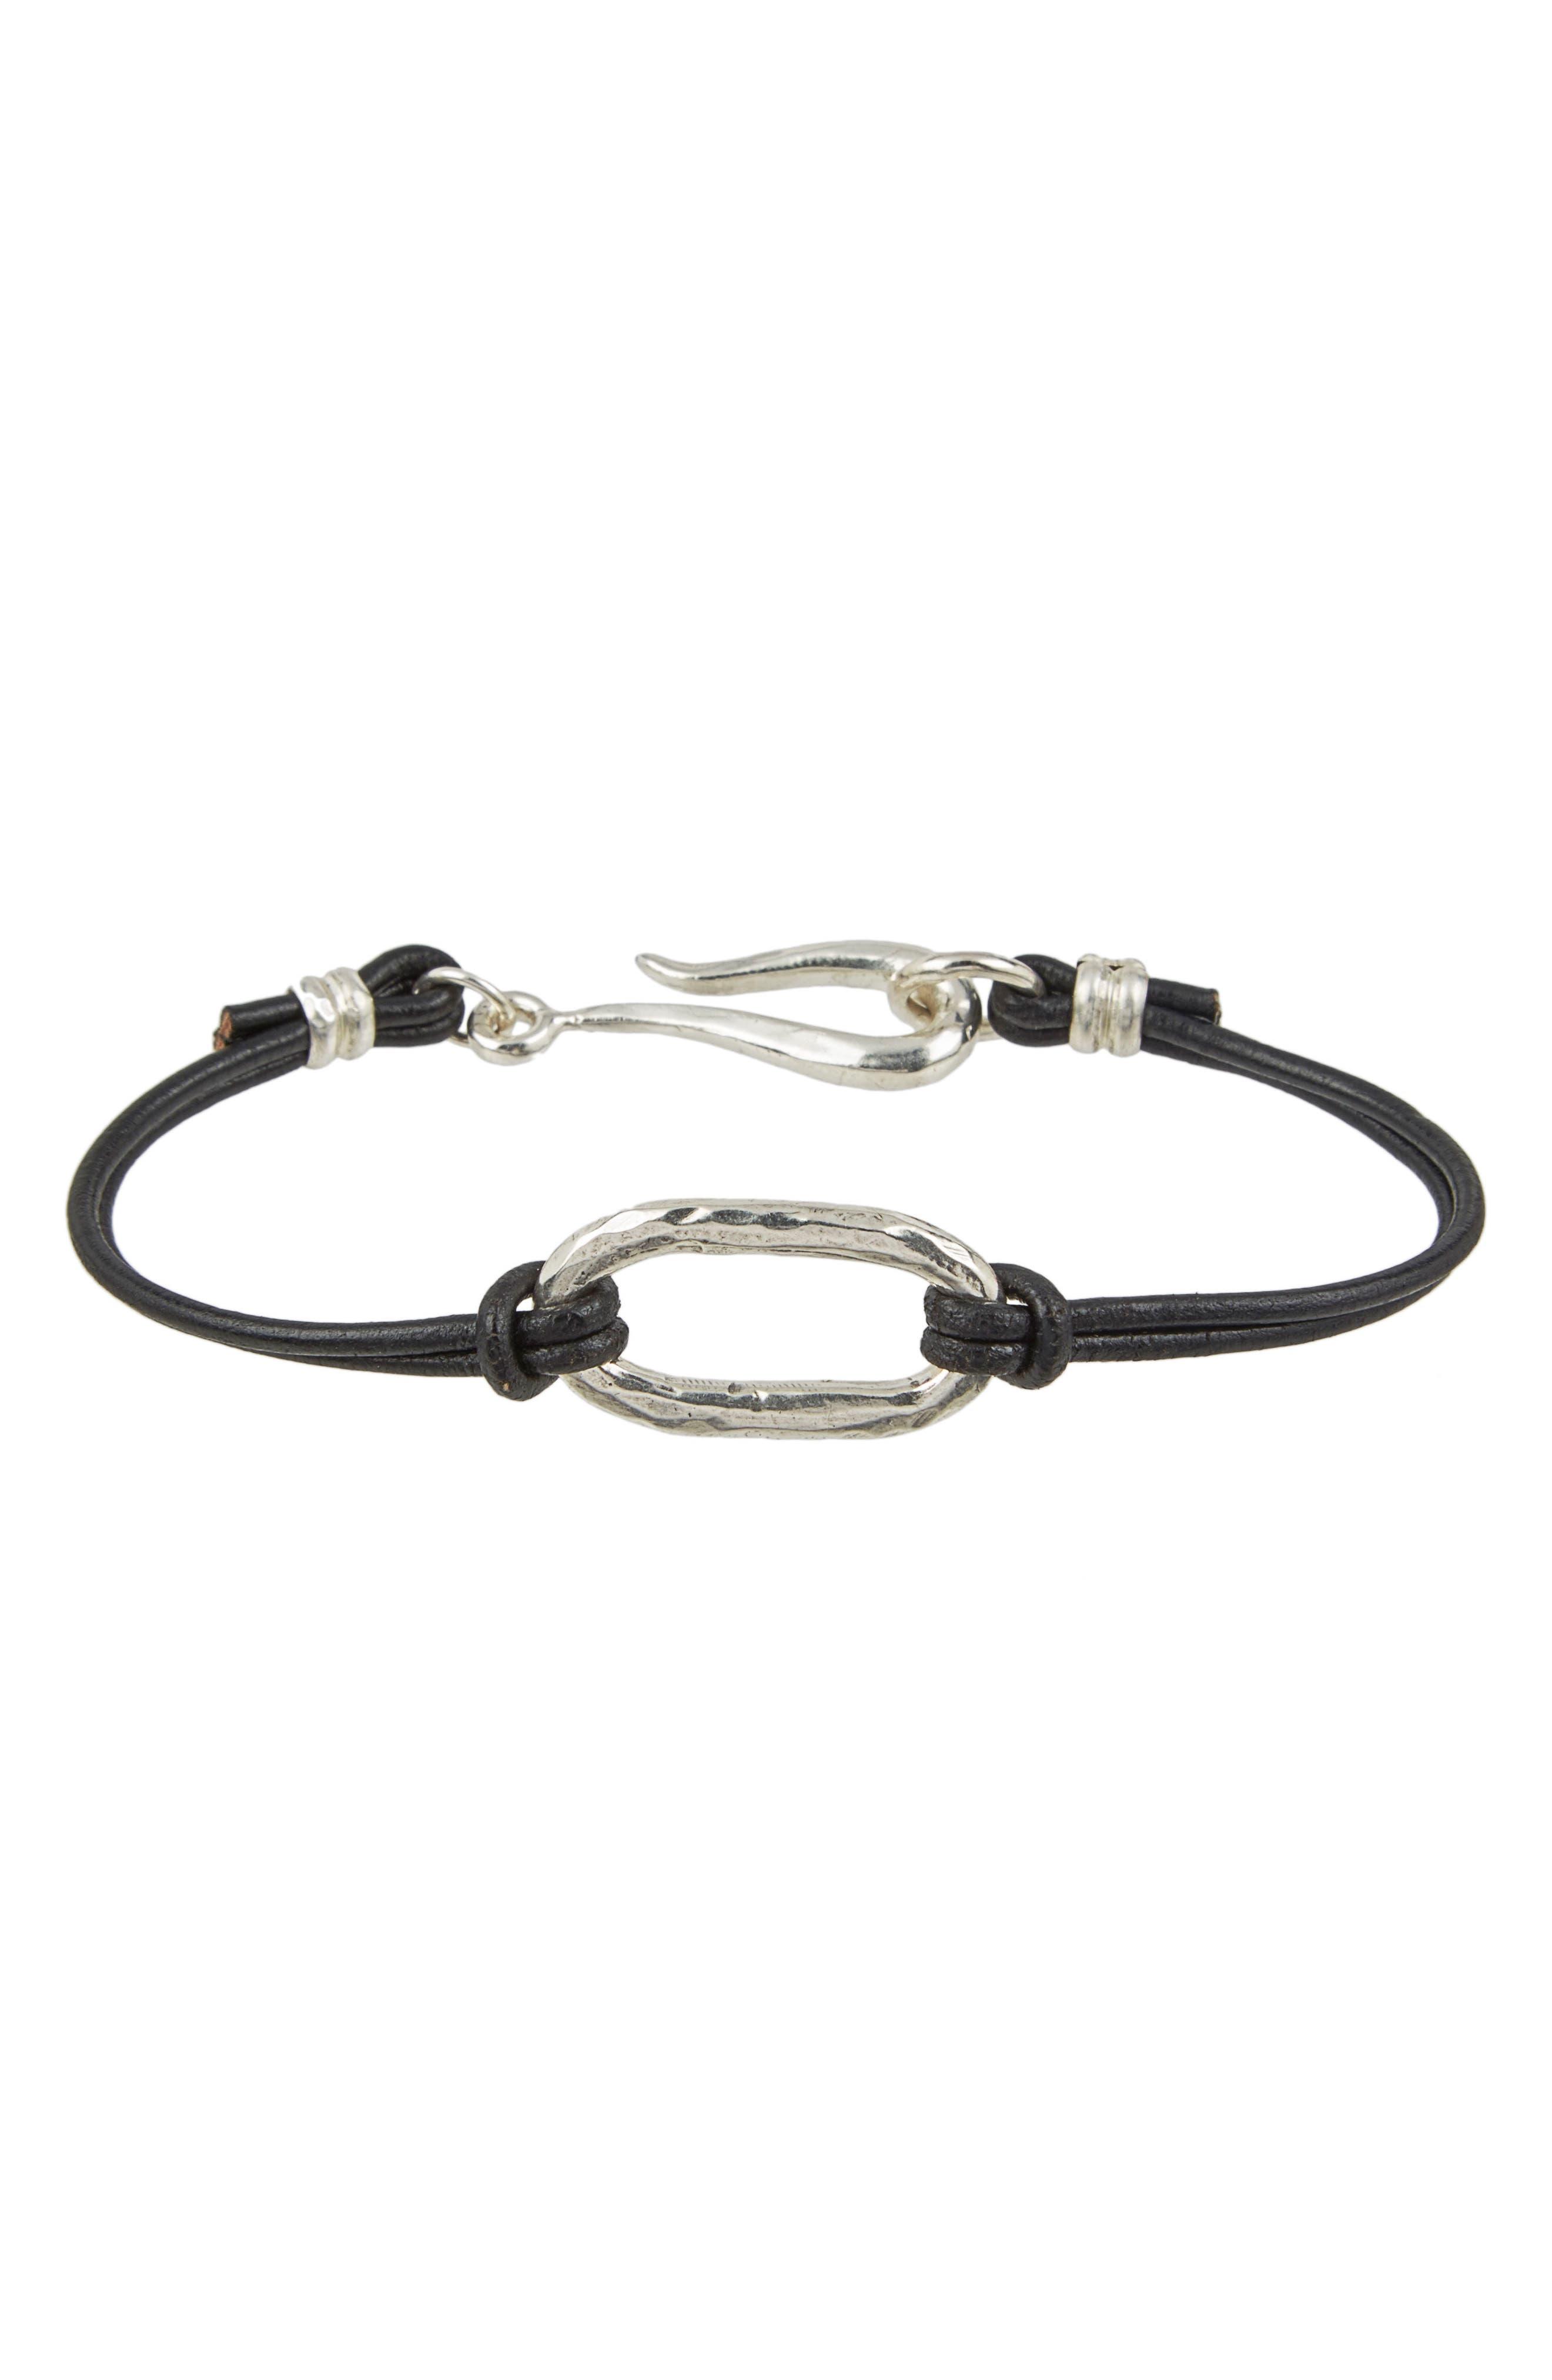 Leather & Sterling Bracelet,                             Main thumbnail 1, color,                             040